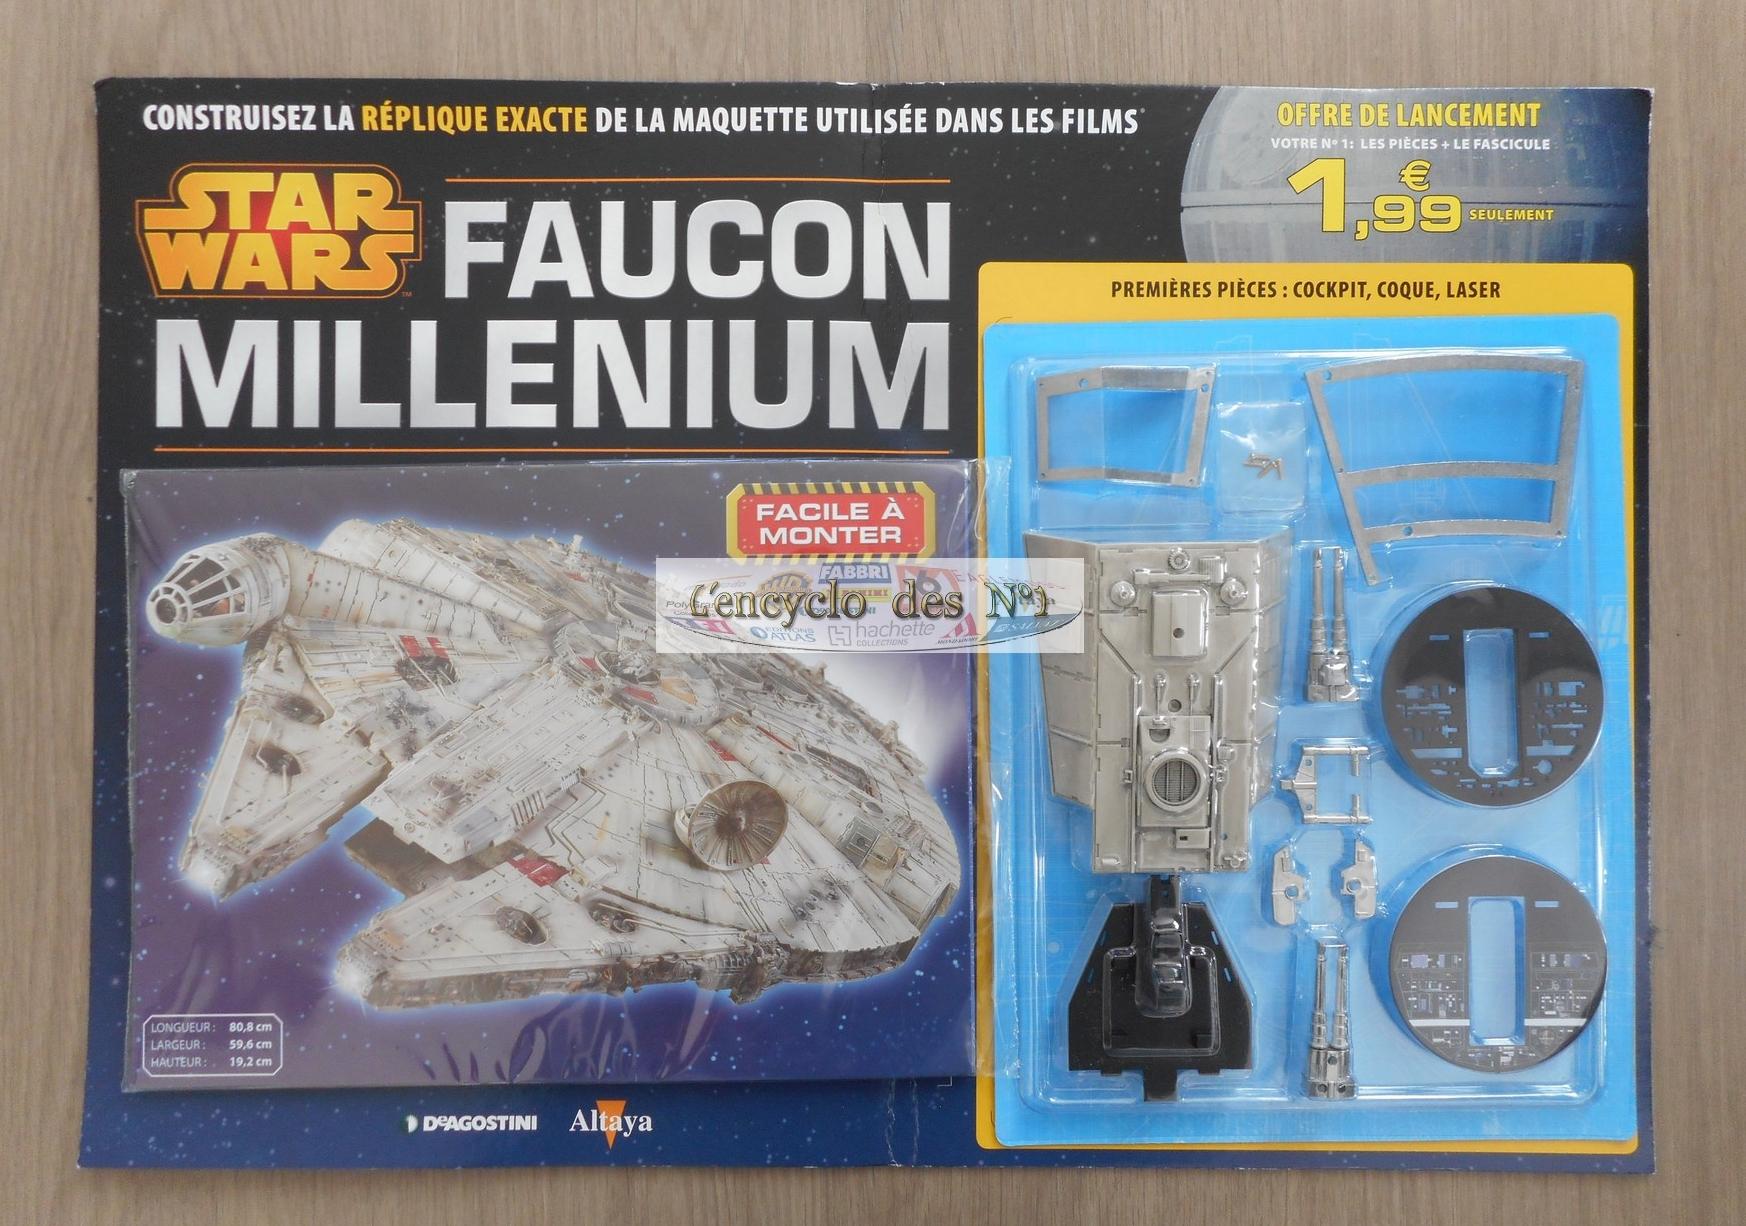 N° 1 Collection construisez le Faucon Millenium - Altaya - Août 2015 RmdAhD4dcEXmKsR9EUYLMIbfwCM